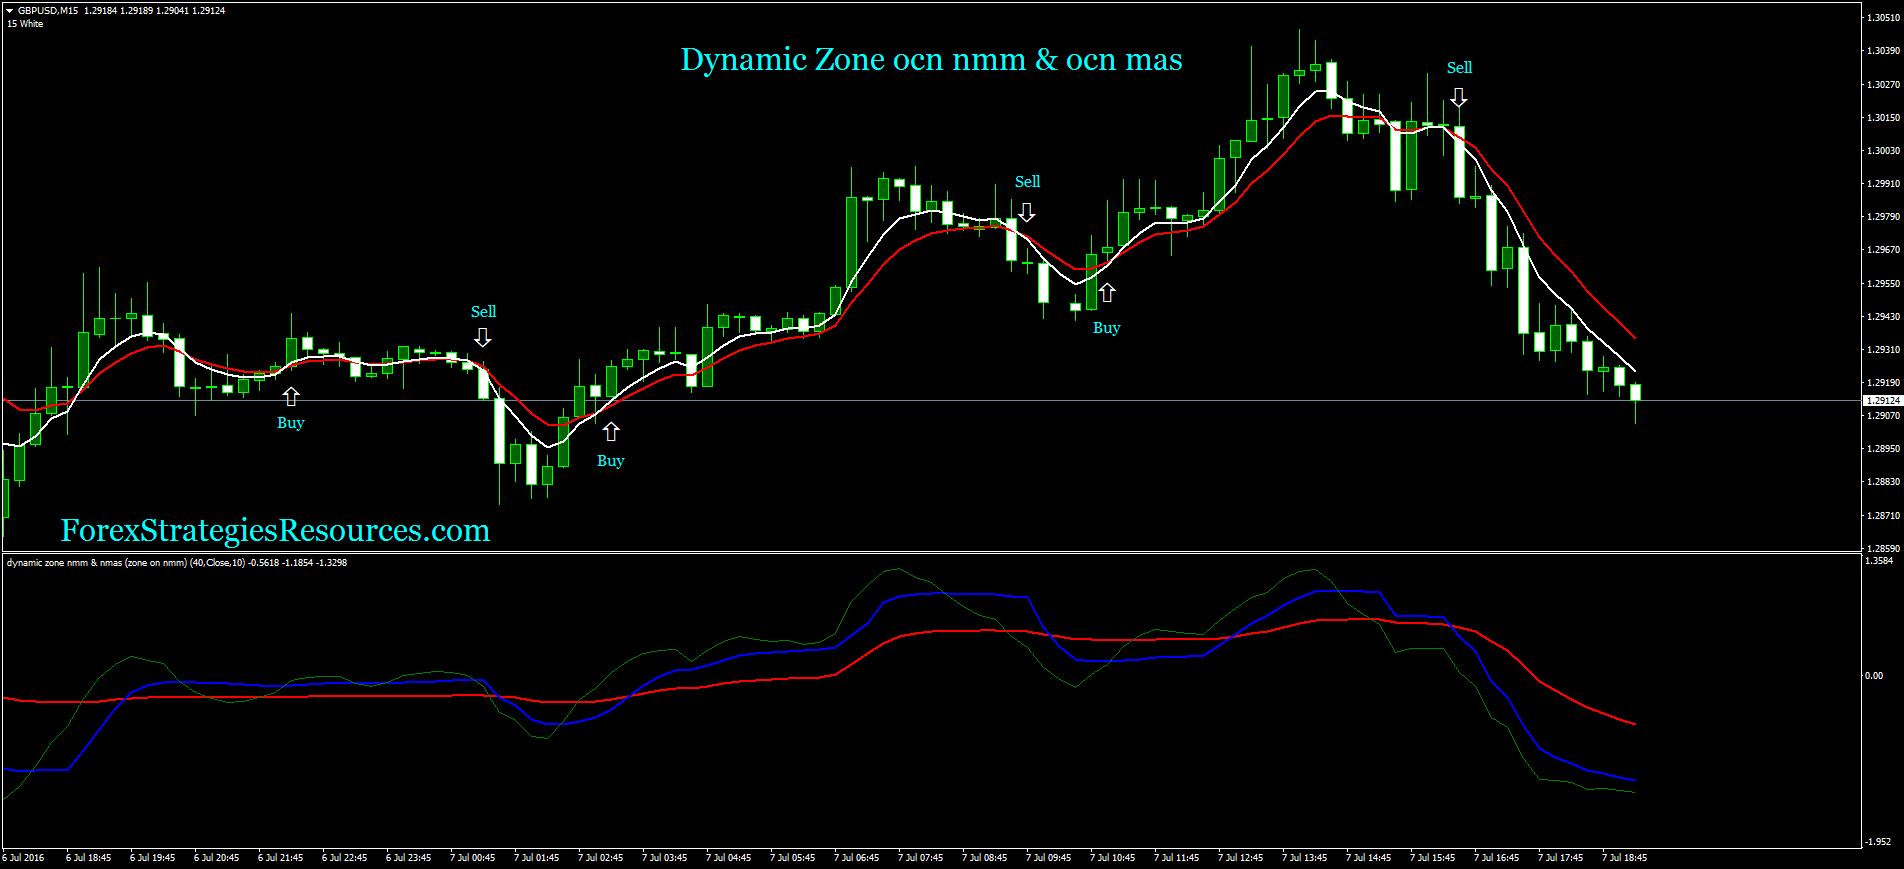 Dynamic Zone ocn nmm & ocn mas - Forex Strategies - Forex Resources - Forex Trading-free forex ...